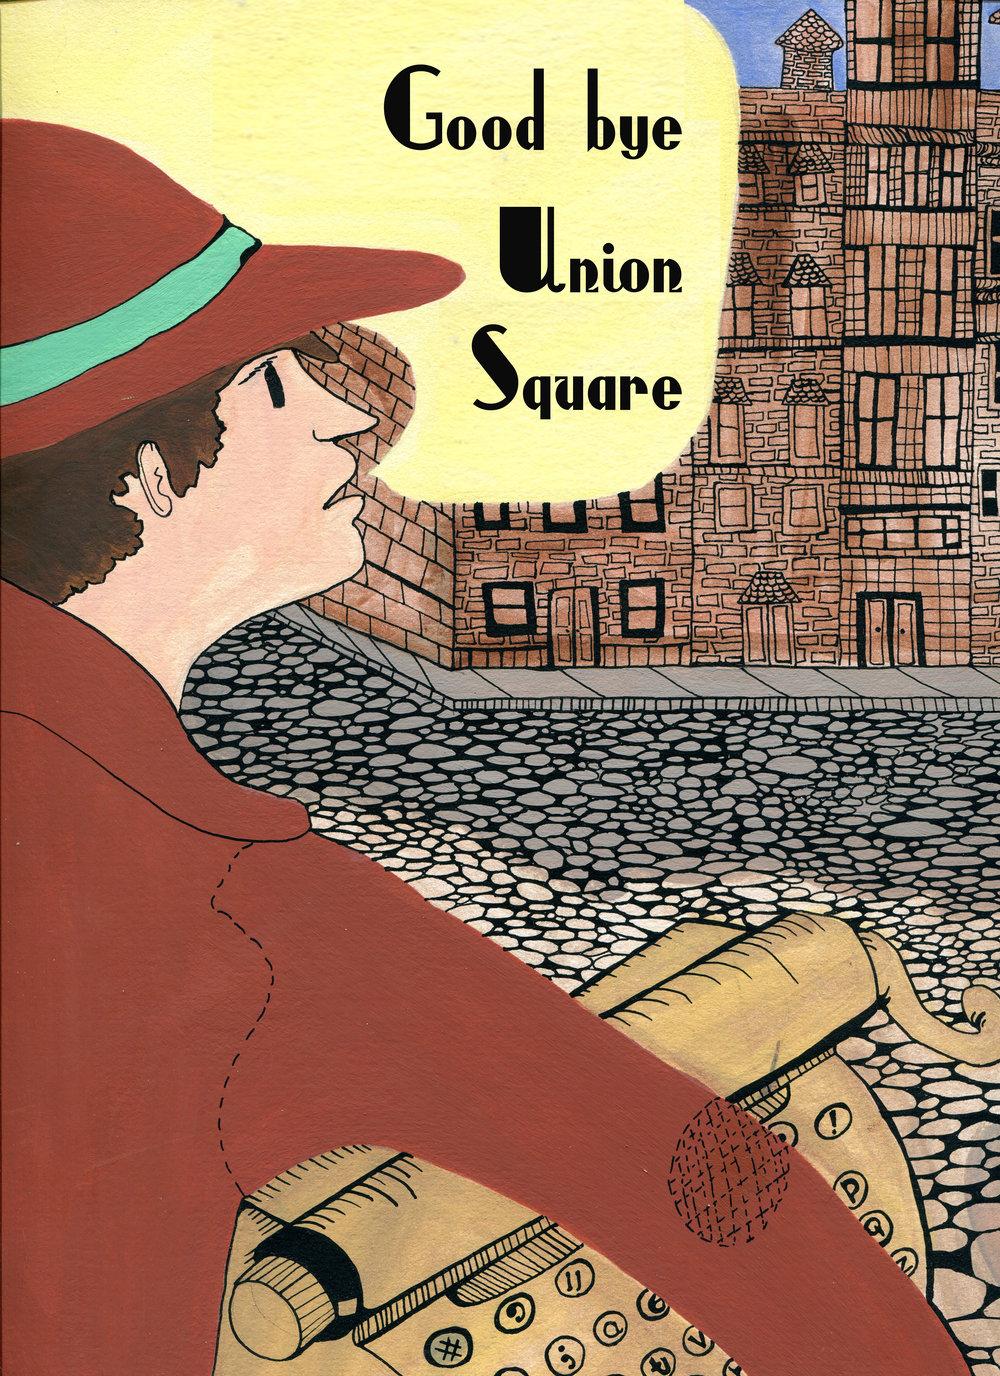 good bye union square.jpg